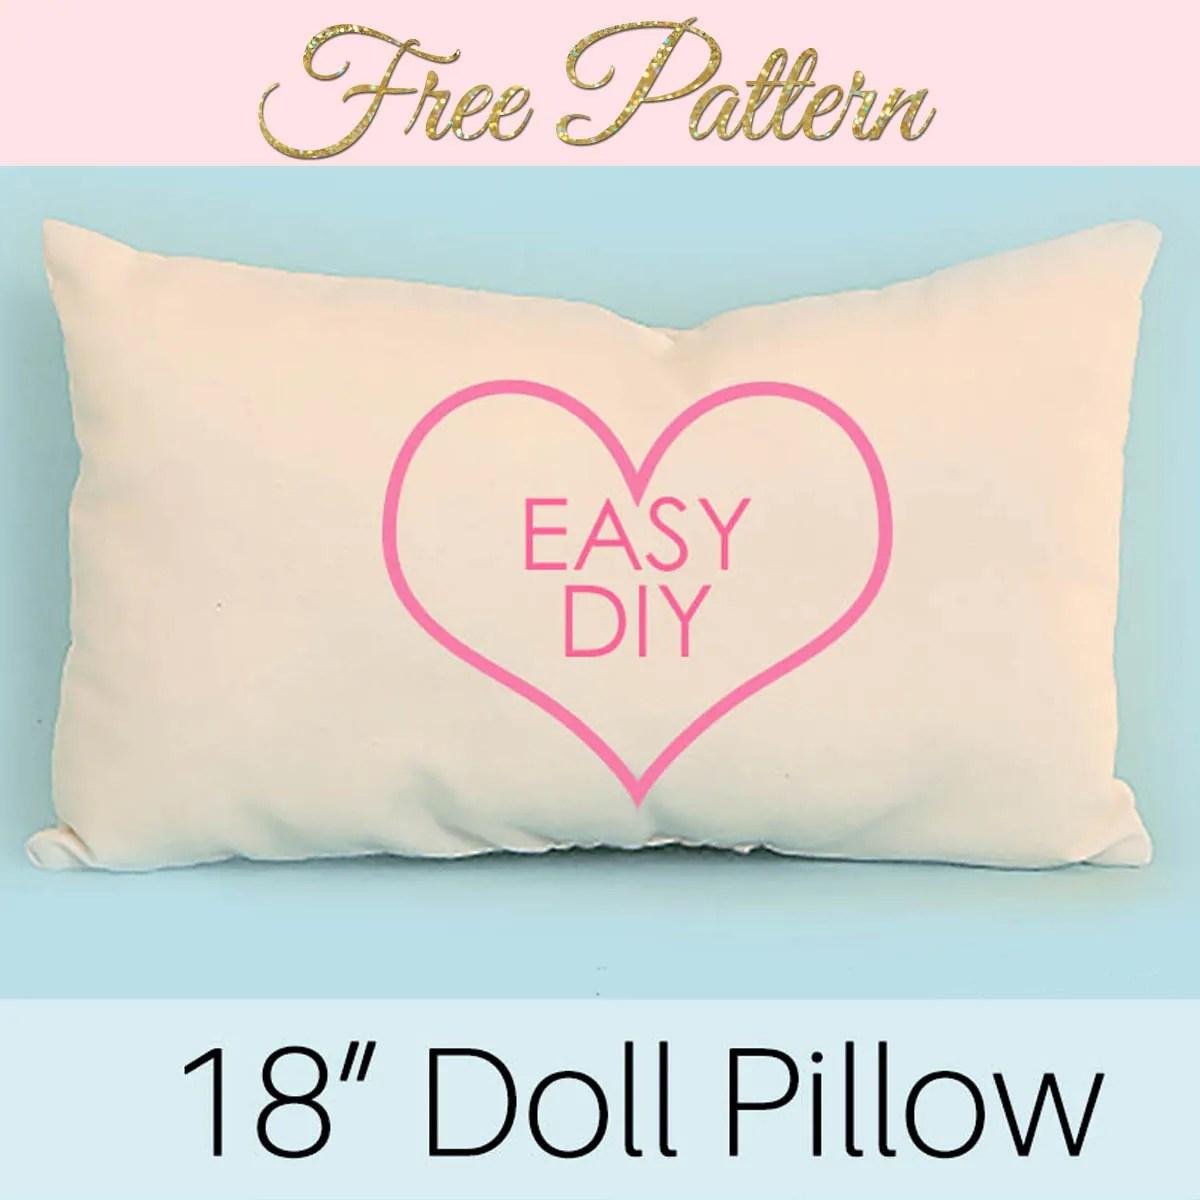 How to Make a Doll Pillow - FREE Doll Bedding Series & DIY Travel Pillow Neck Pillow - Free Pattern |TREASURIE pillowsntoast.com